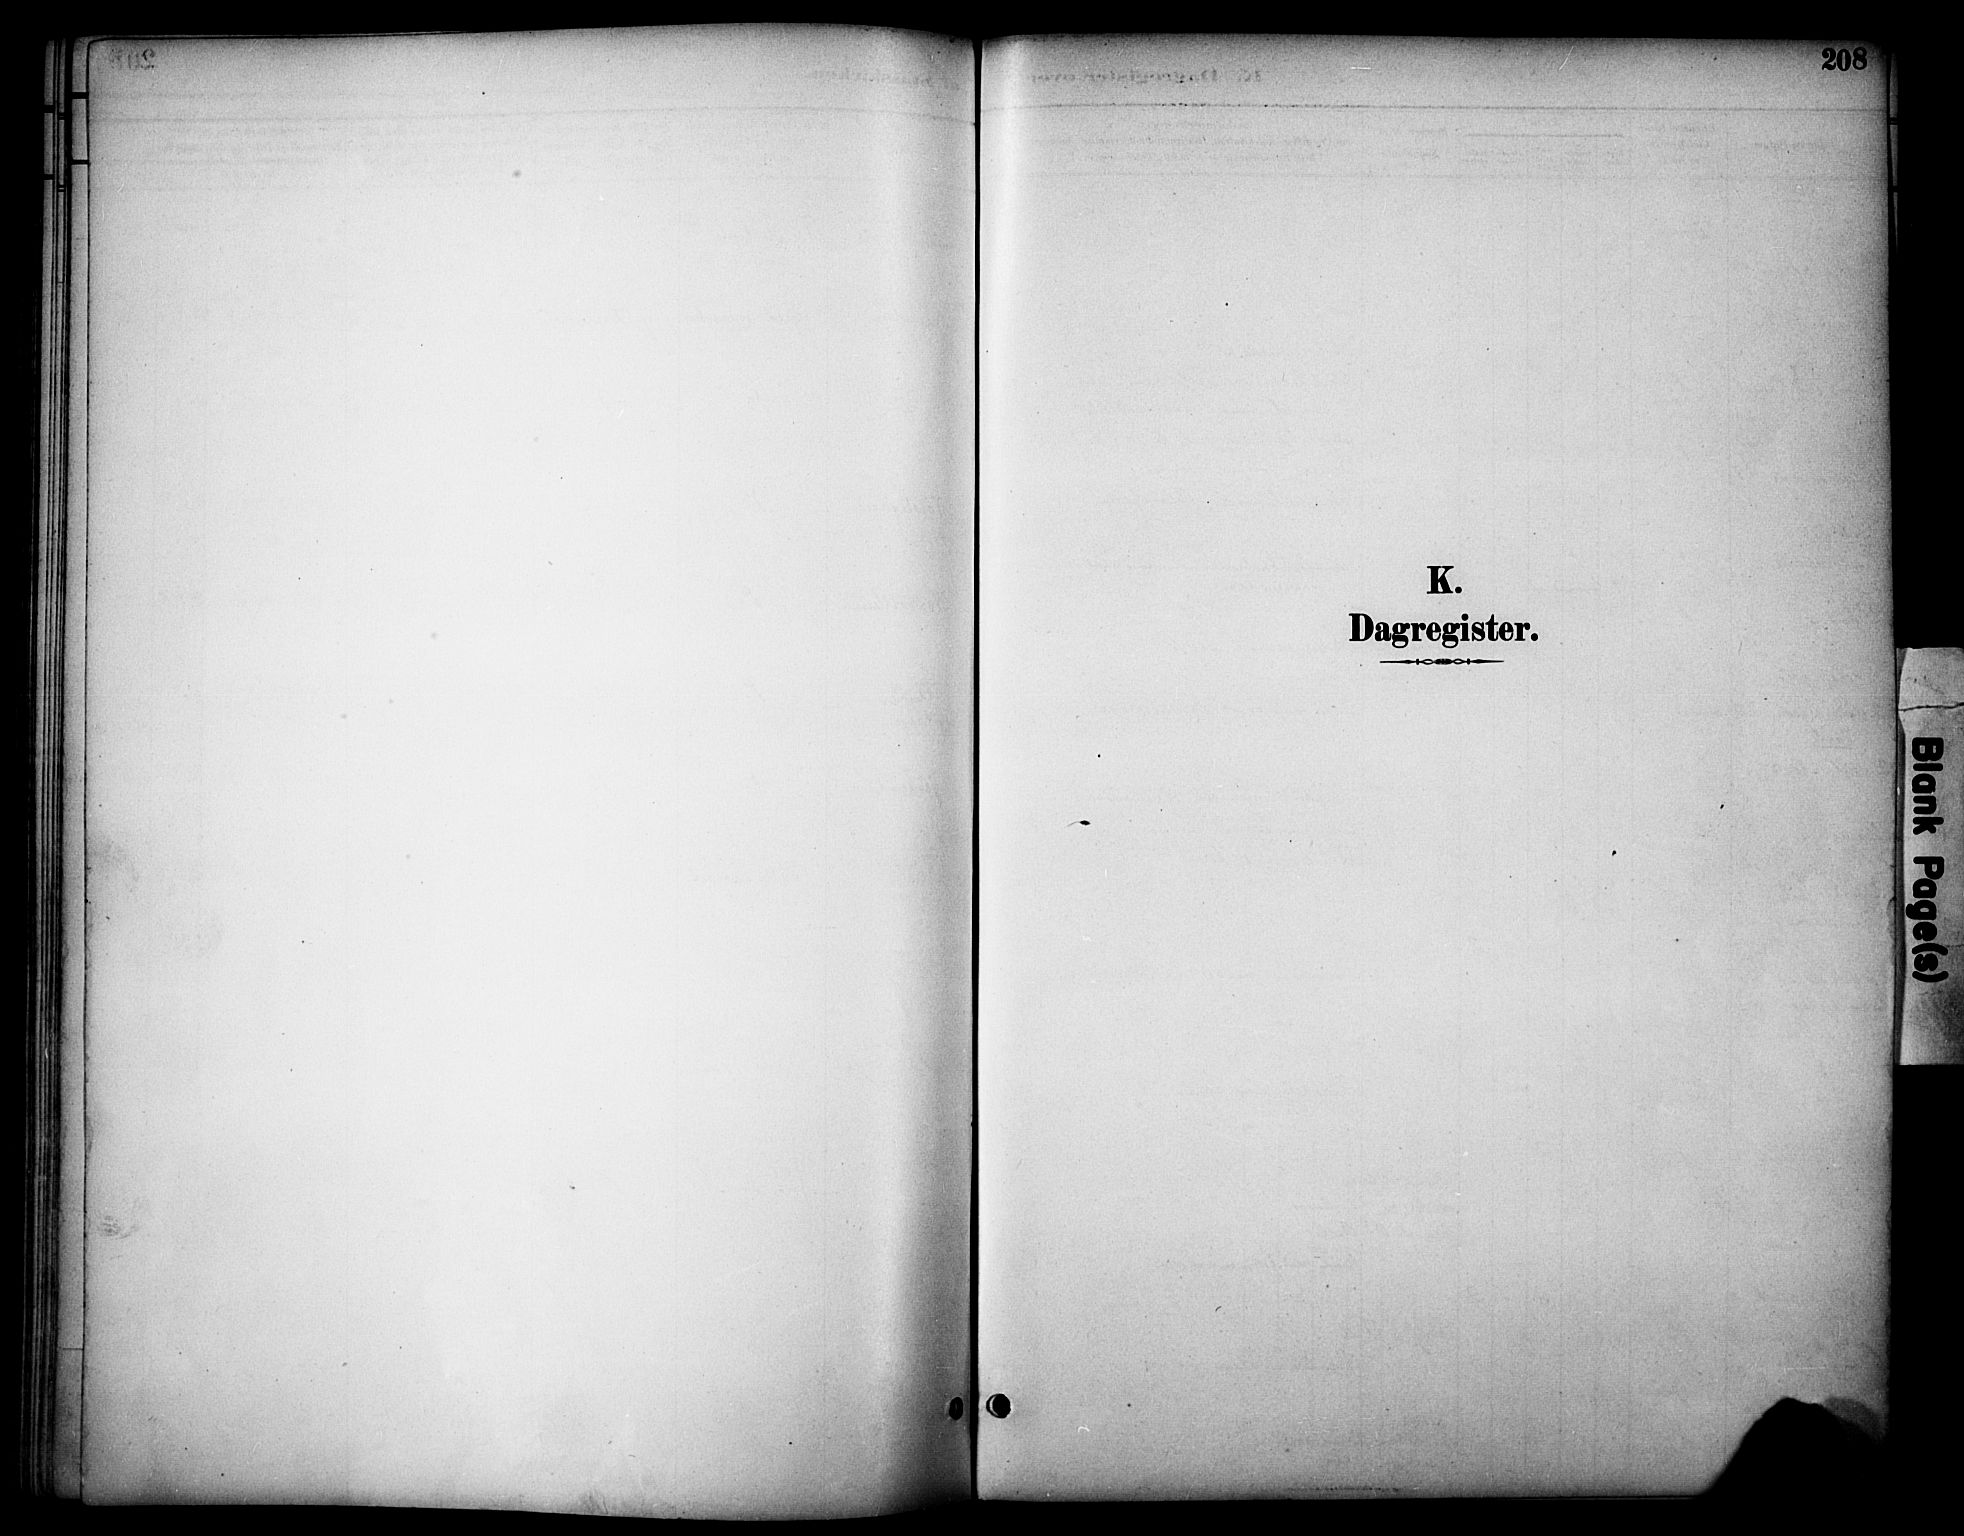 SAH, Dovre prestekontor, Ministerialbok nr. 3, 1891-1901, s. 208